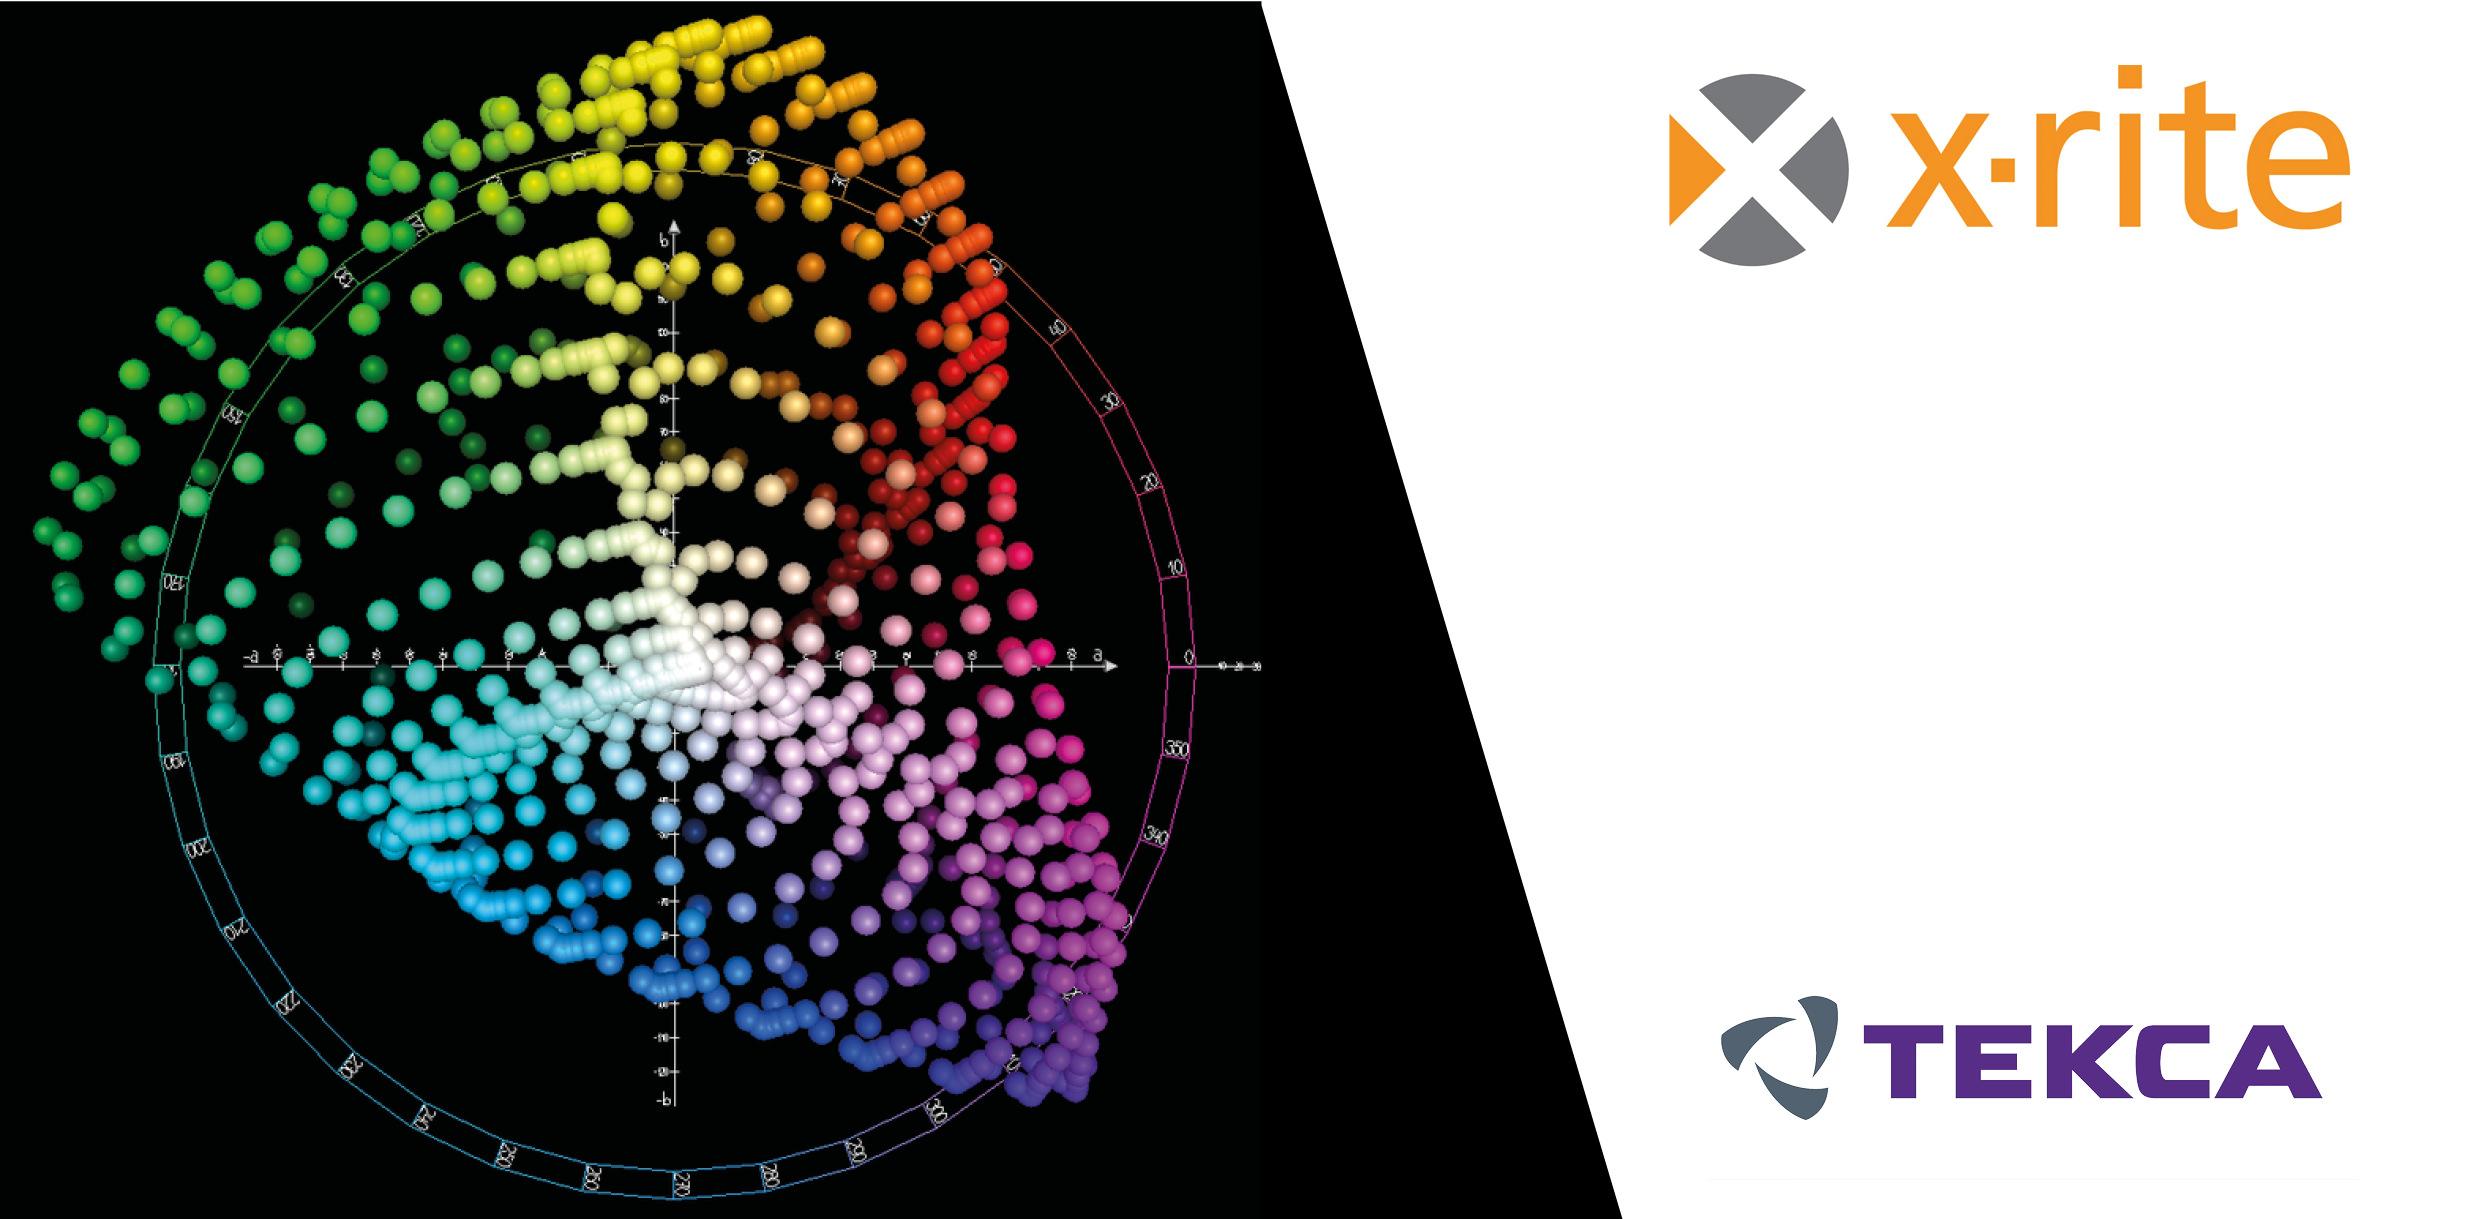 Бесплатный онлайн-курс по теории цвета от X-Rite